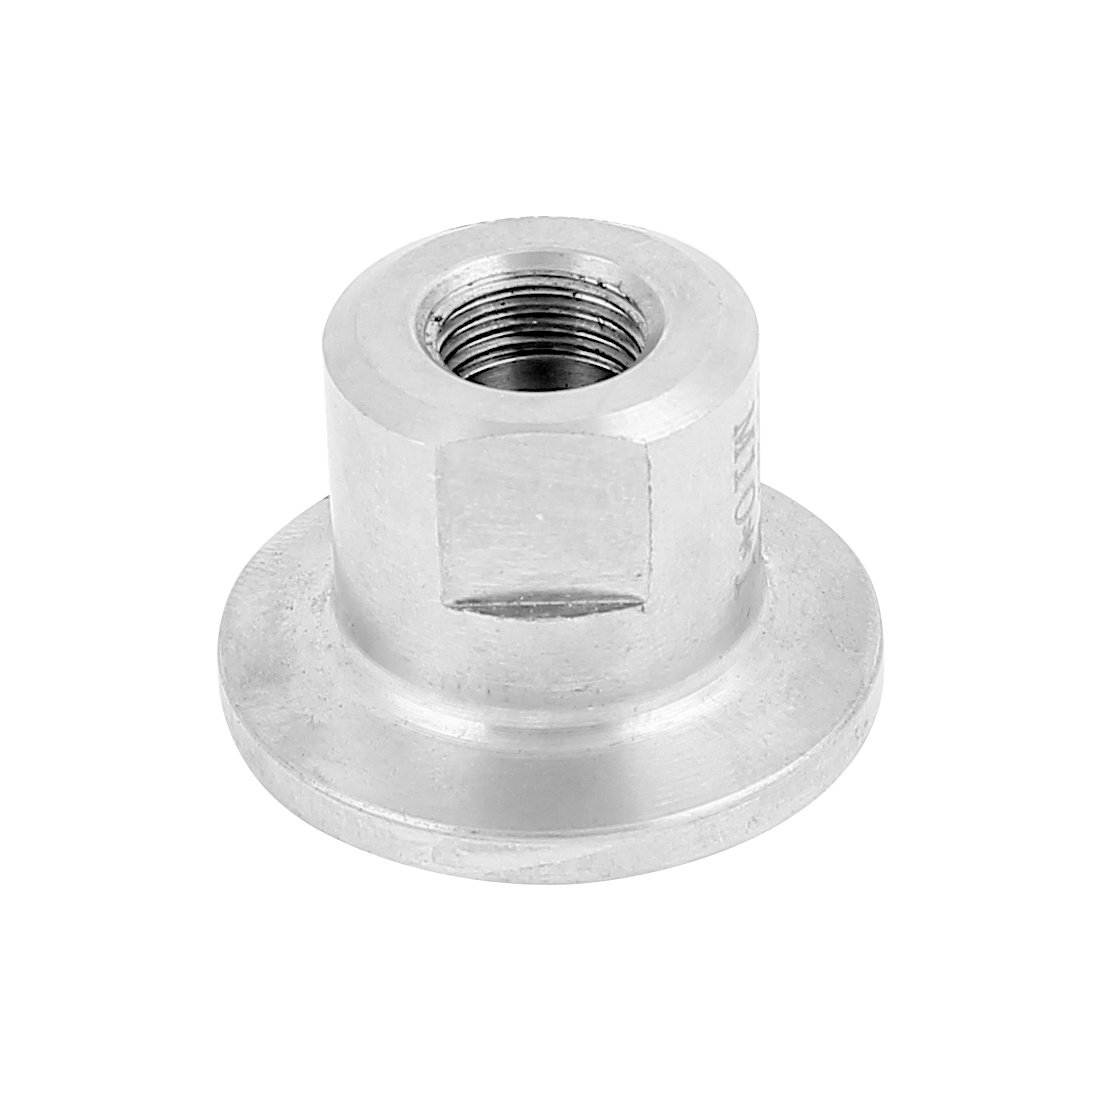 Stainless Steel 304 Vacuum KF16 Flange 1/8BSP Female Thread Adapter